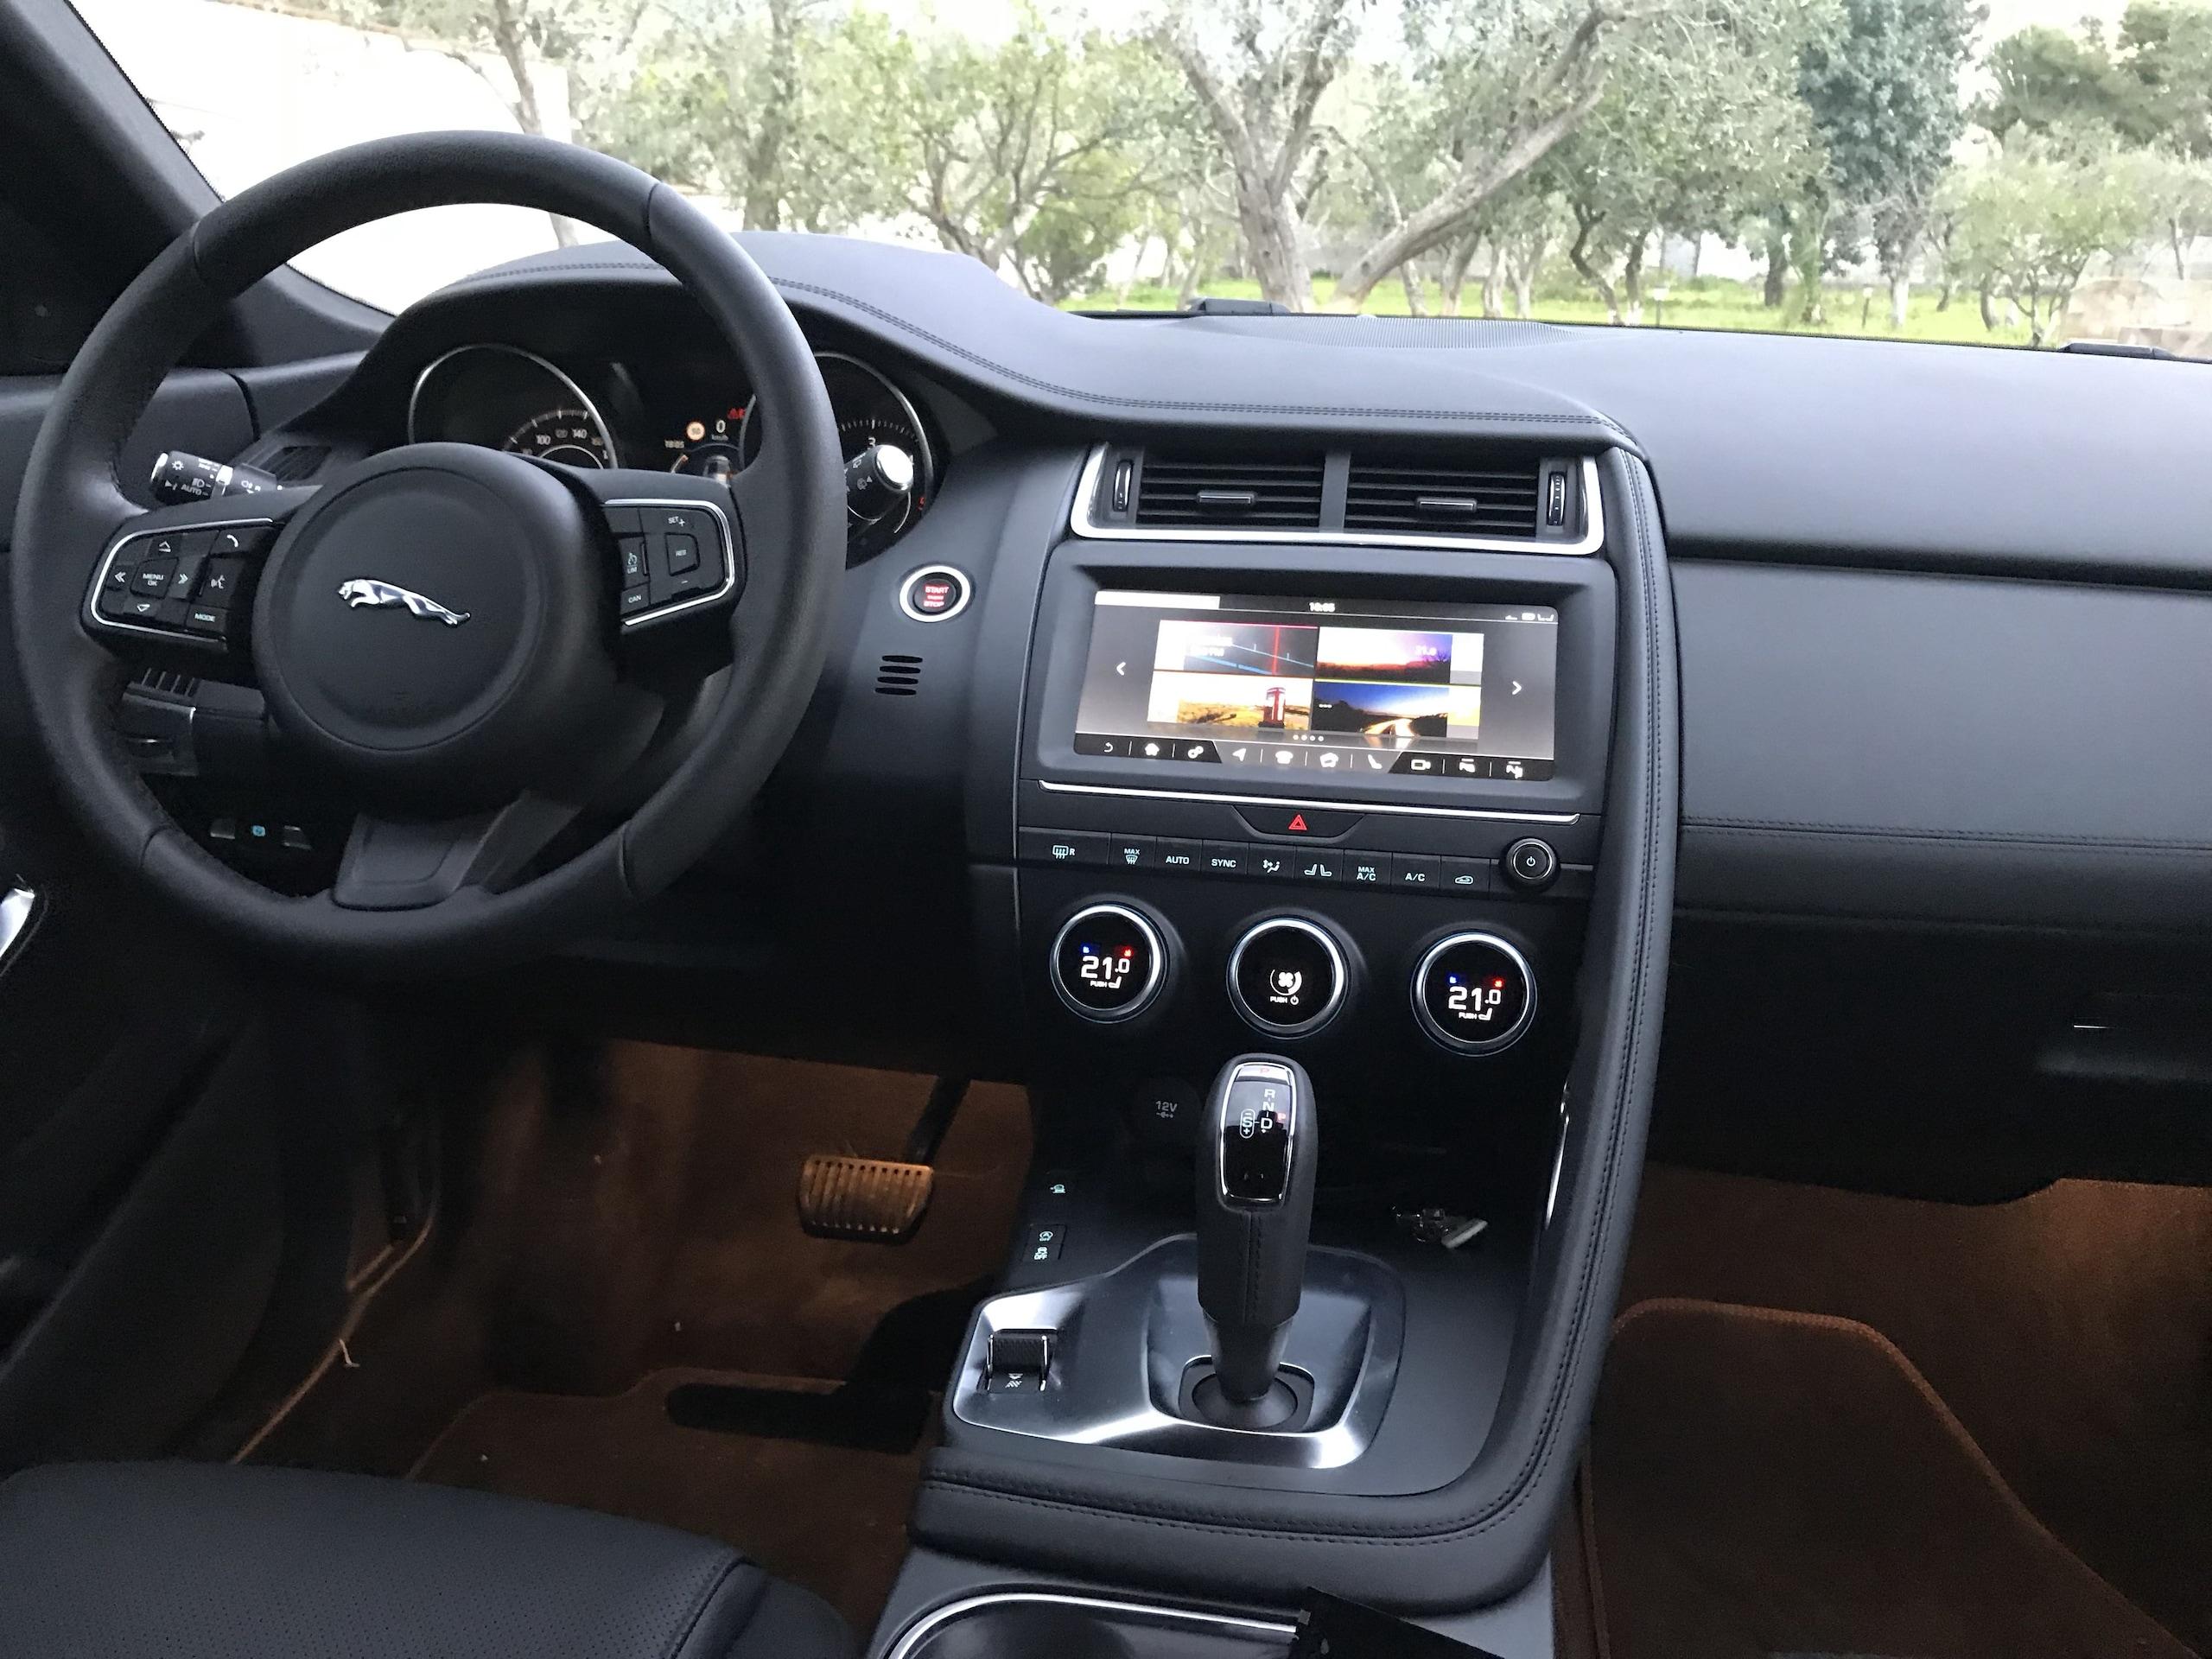 Prova Comparata: Jaguar E-Pace VS Jeep Compass